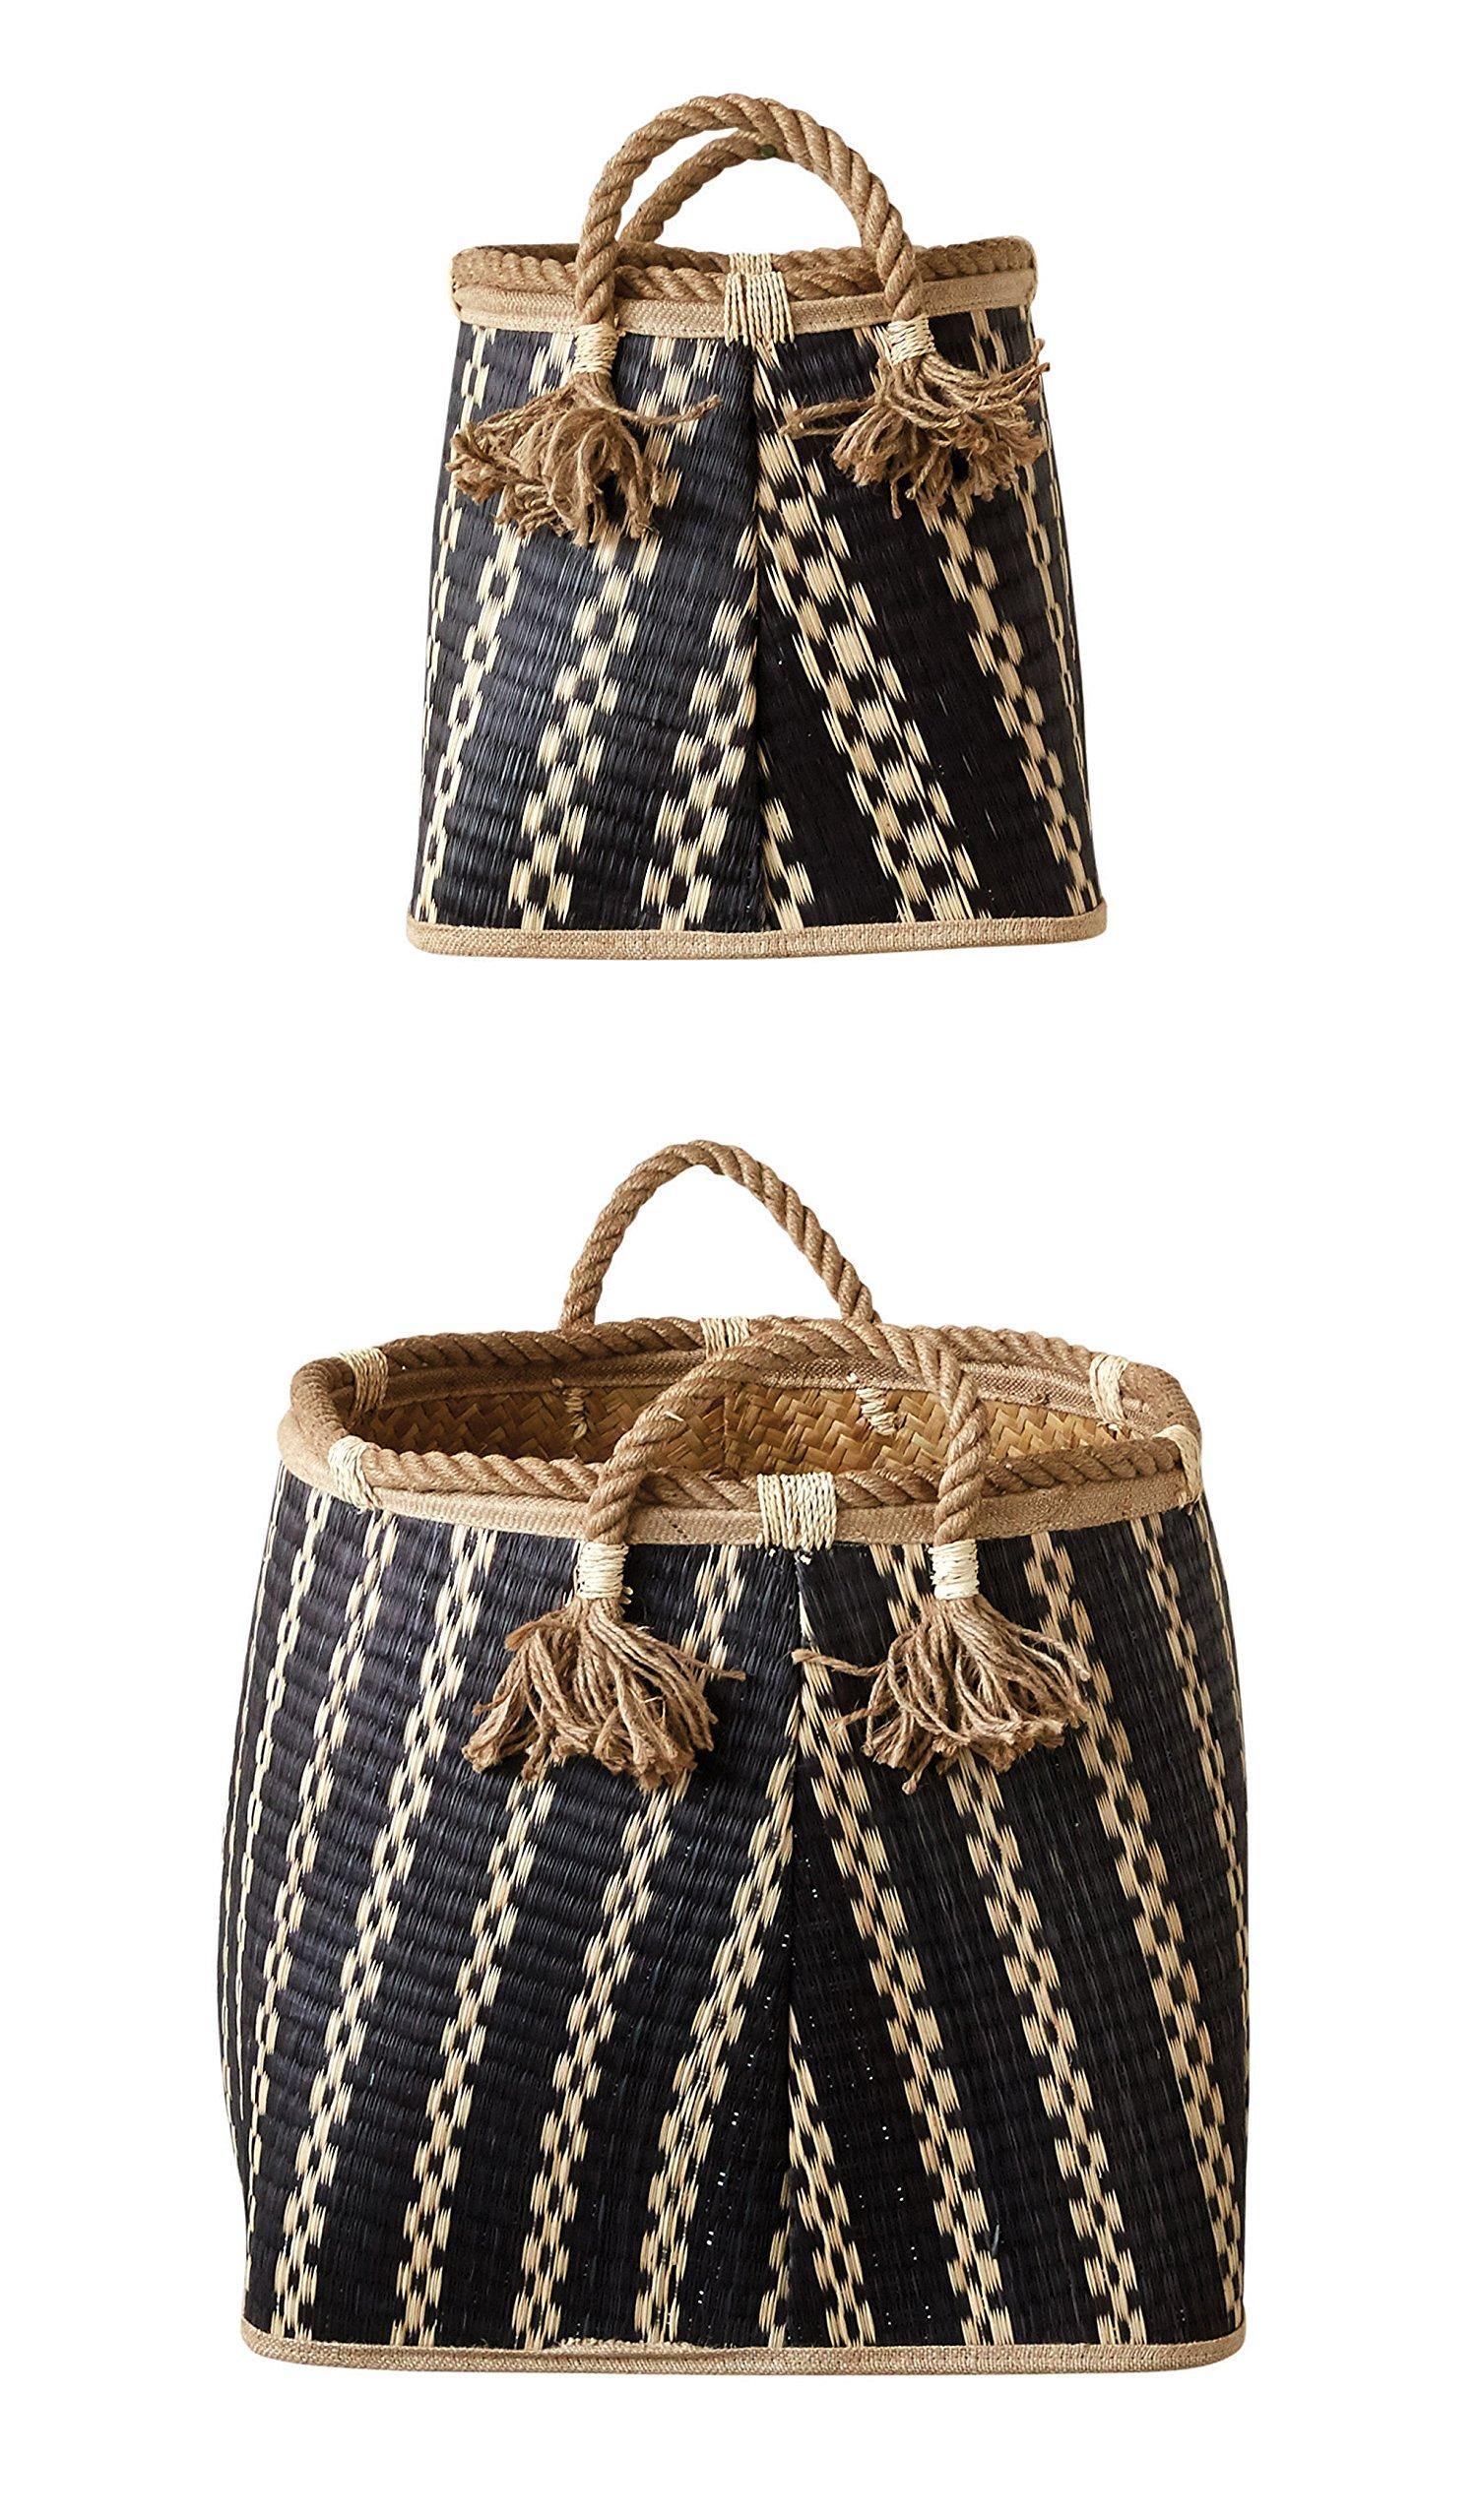 Creative Co-op Wicker Basket Set with Rope Handles